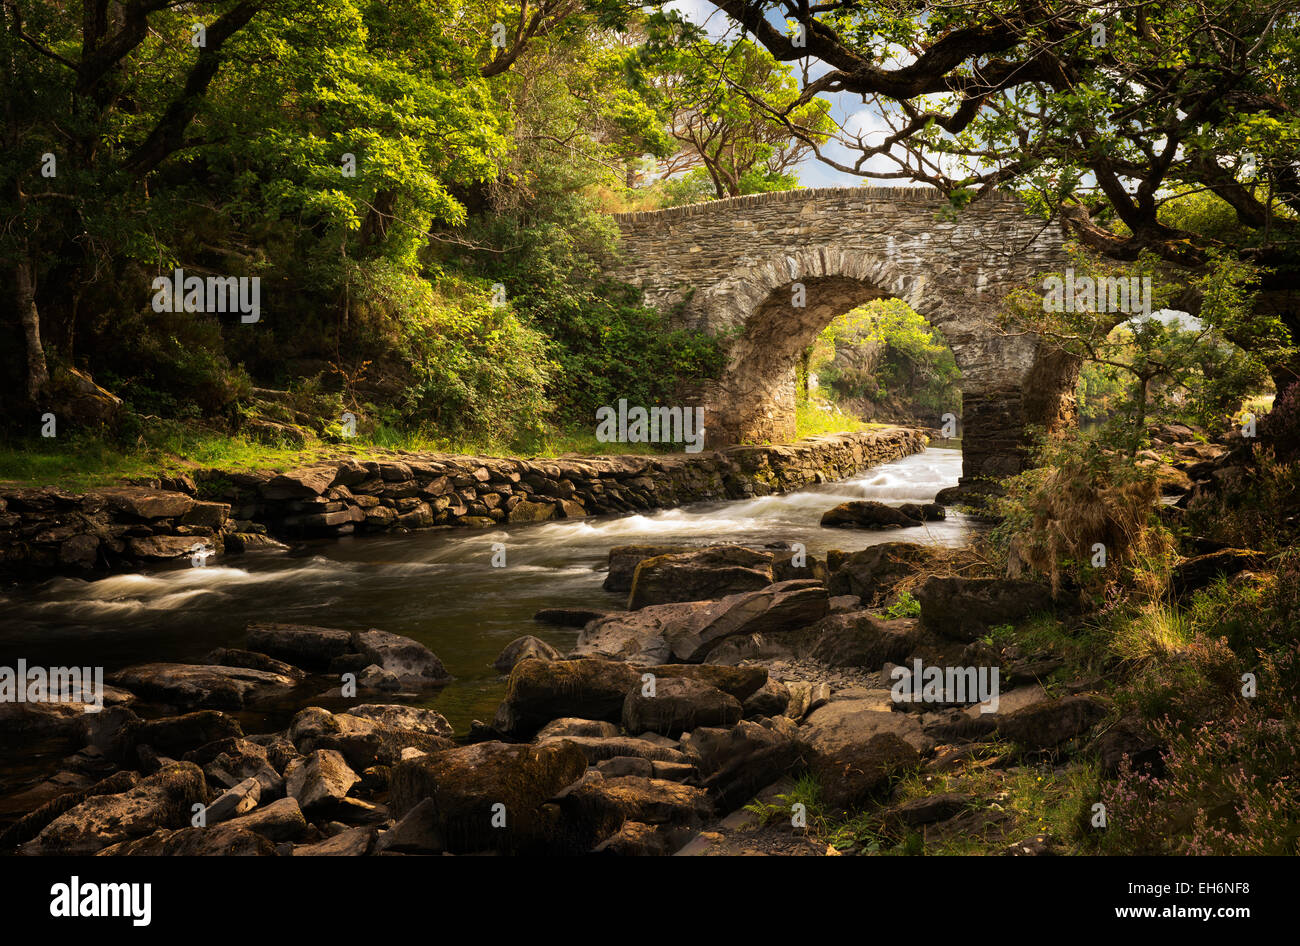 Old weir bridge. Kilanrney Lakes, Gap of Dunloe. Killarney National Park, Ireland - Stock Image